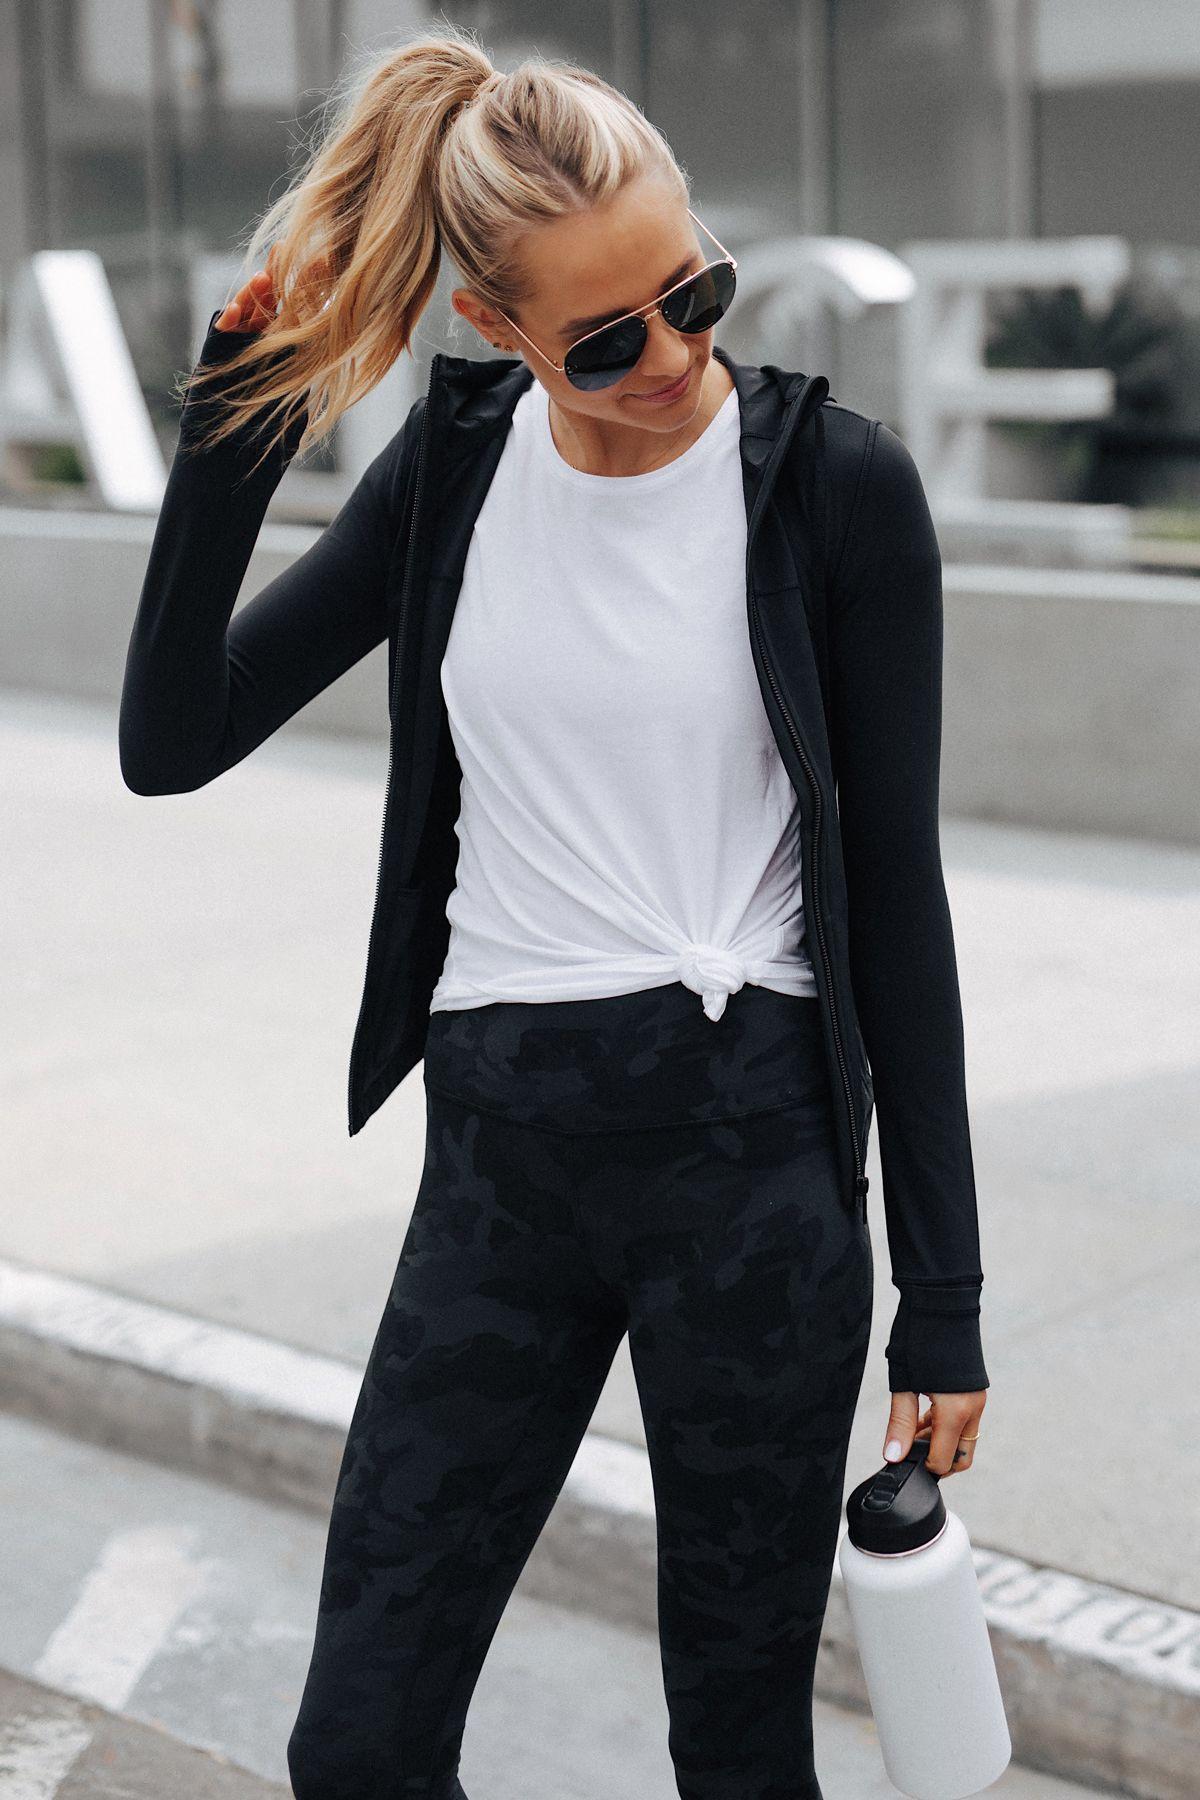 Fashion Jackson Wearing Lululemon Align Pants Black Camo Print Lululemon Black Jacket White Top Outfits With Leggings Lululemon Outfits Sporty Outfits